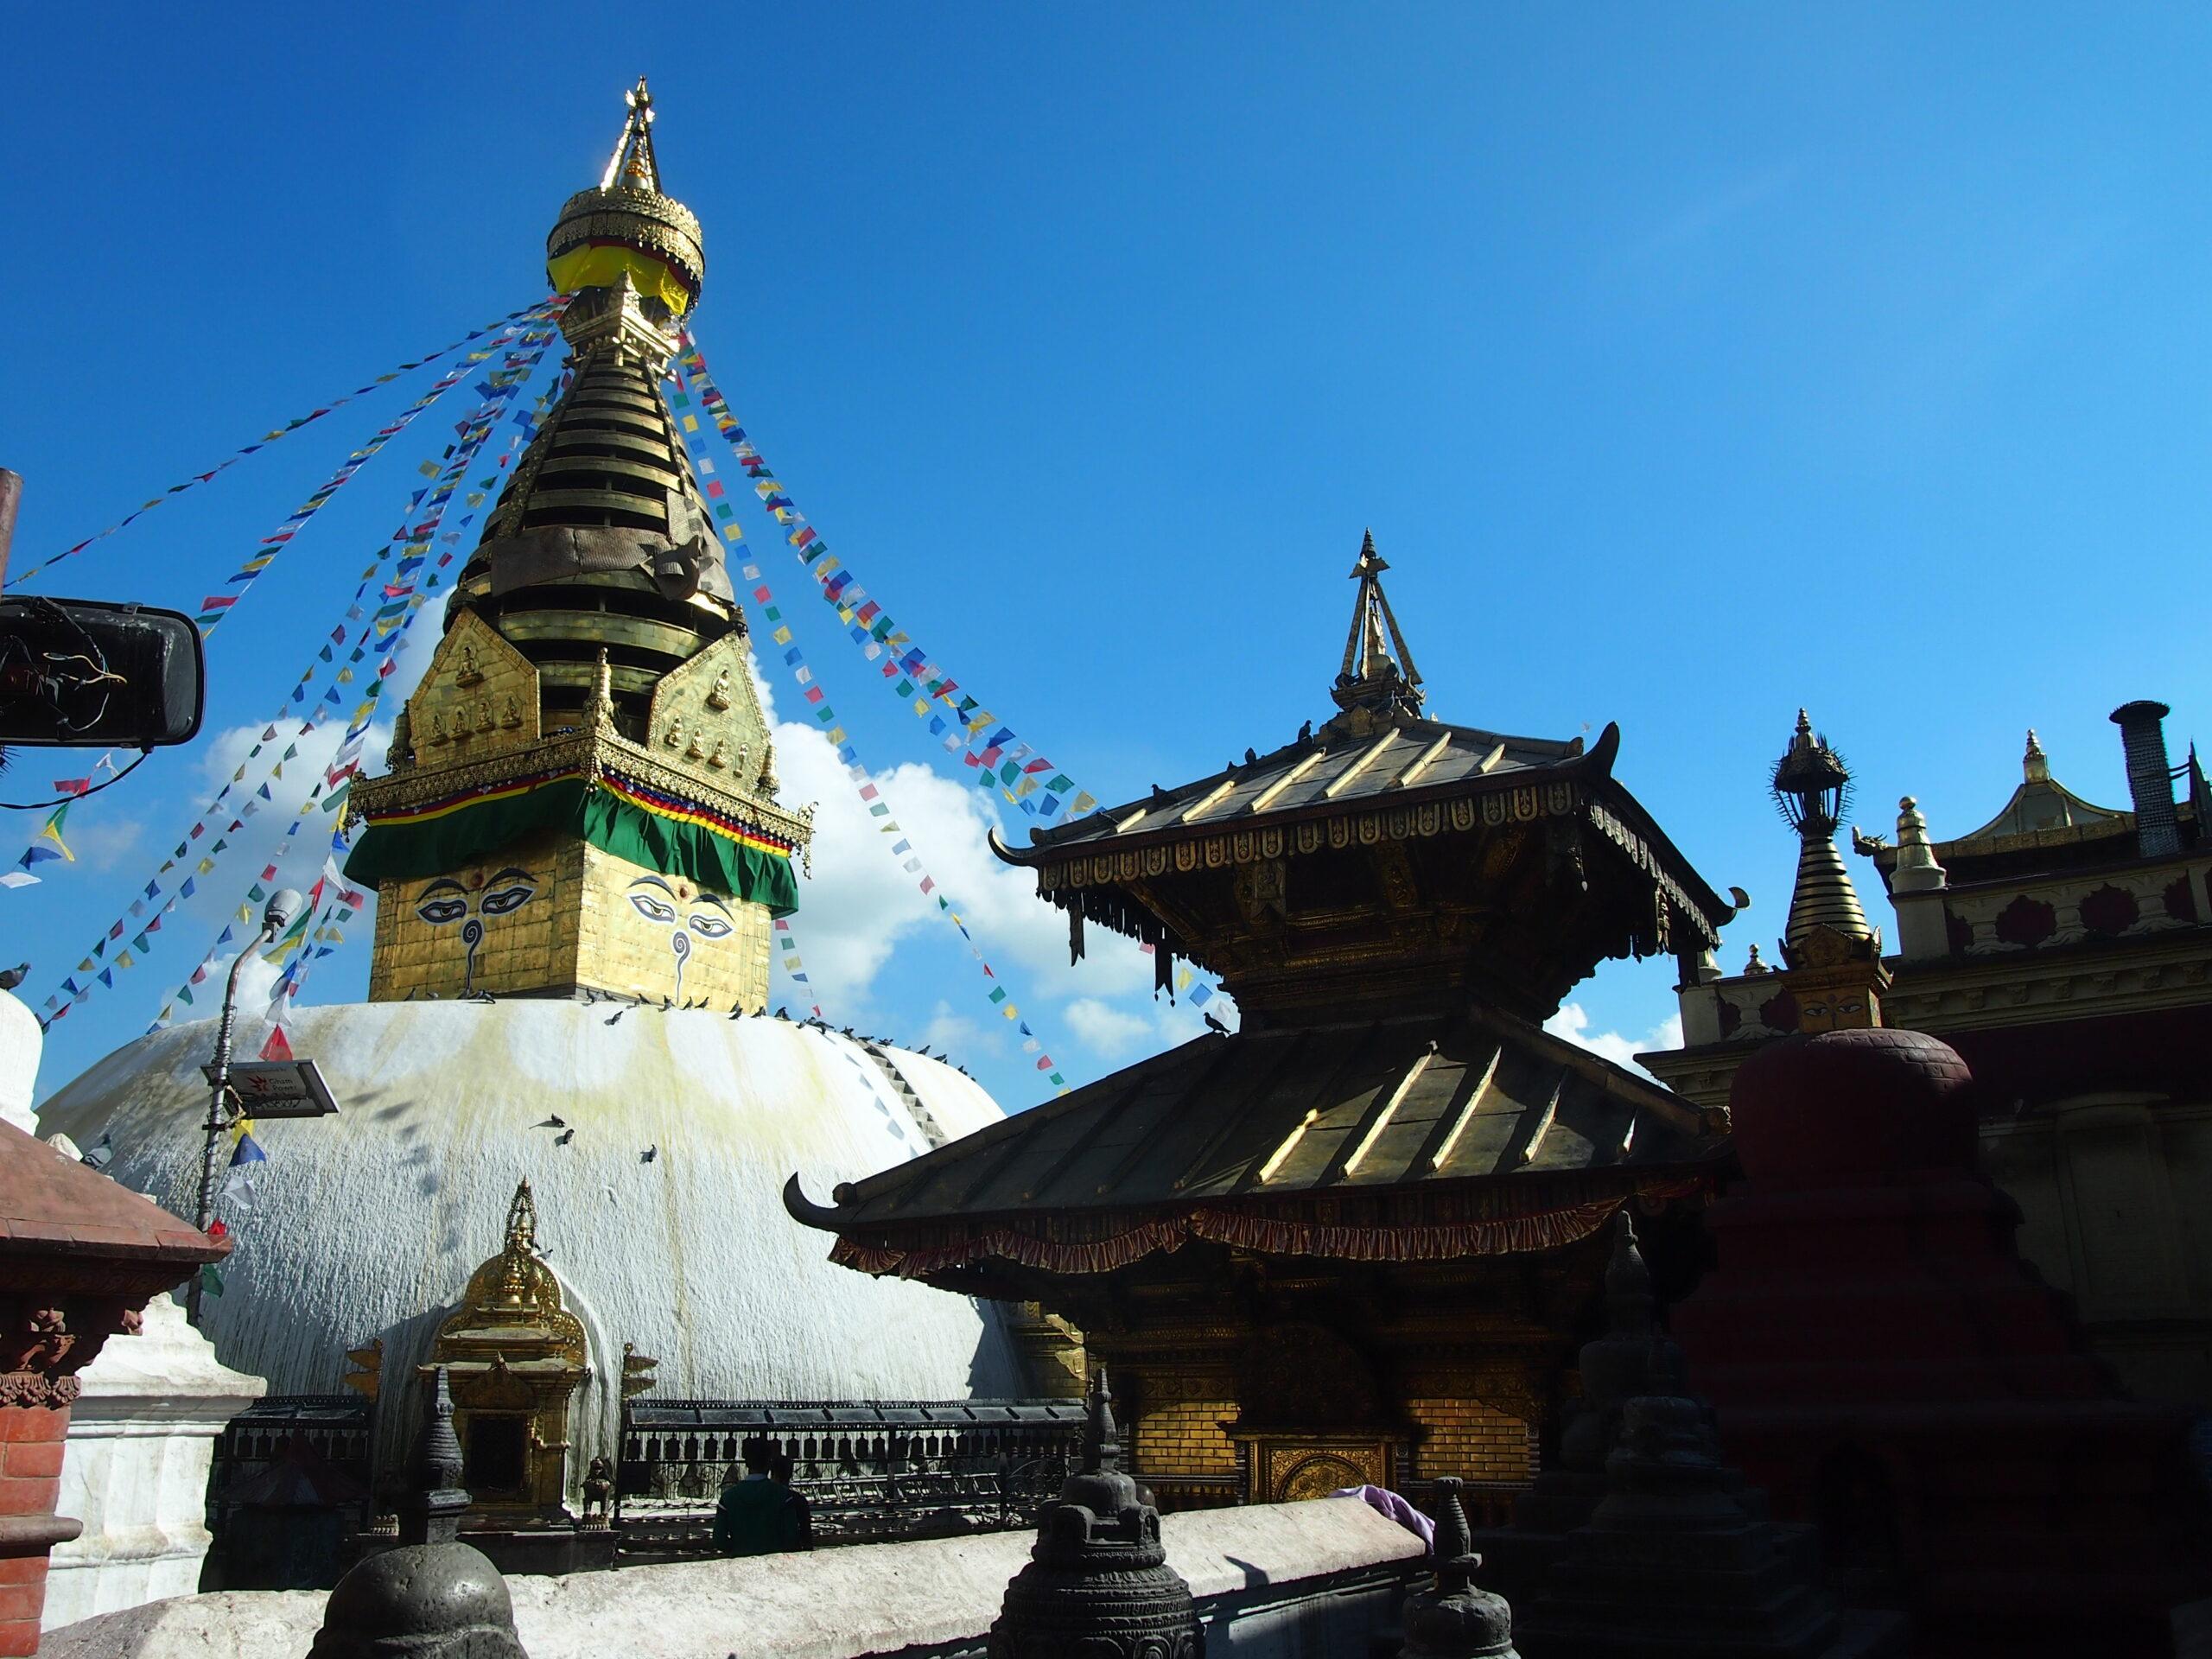 UNESCO Cultural Heritage Sites in Nepal